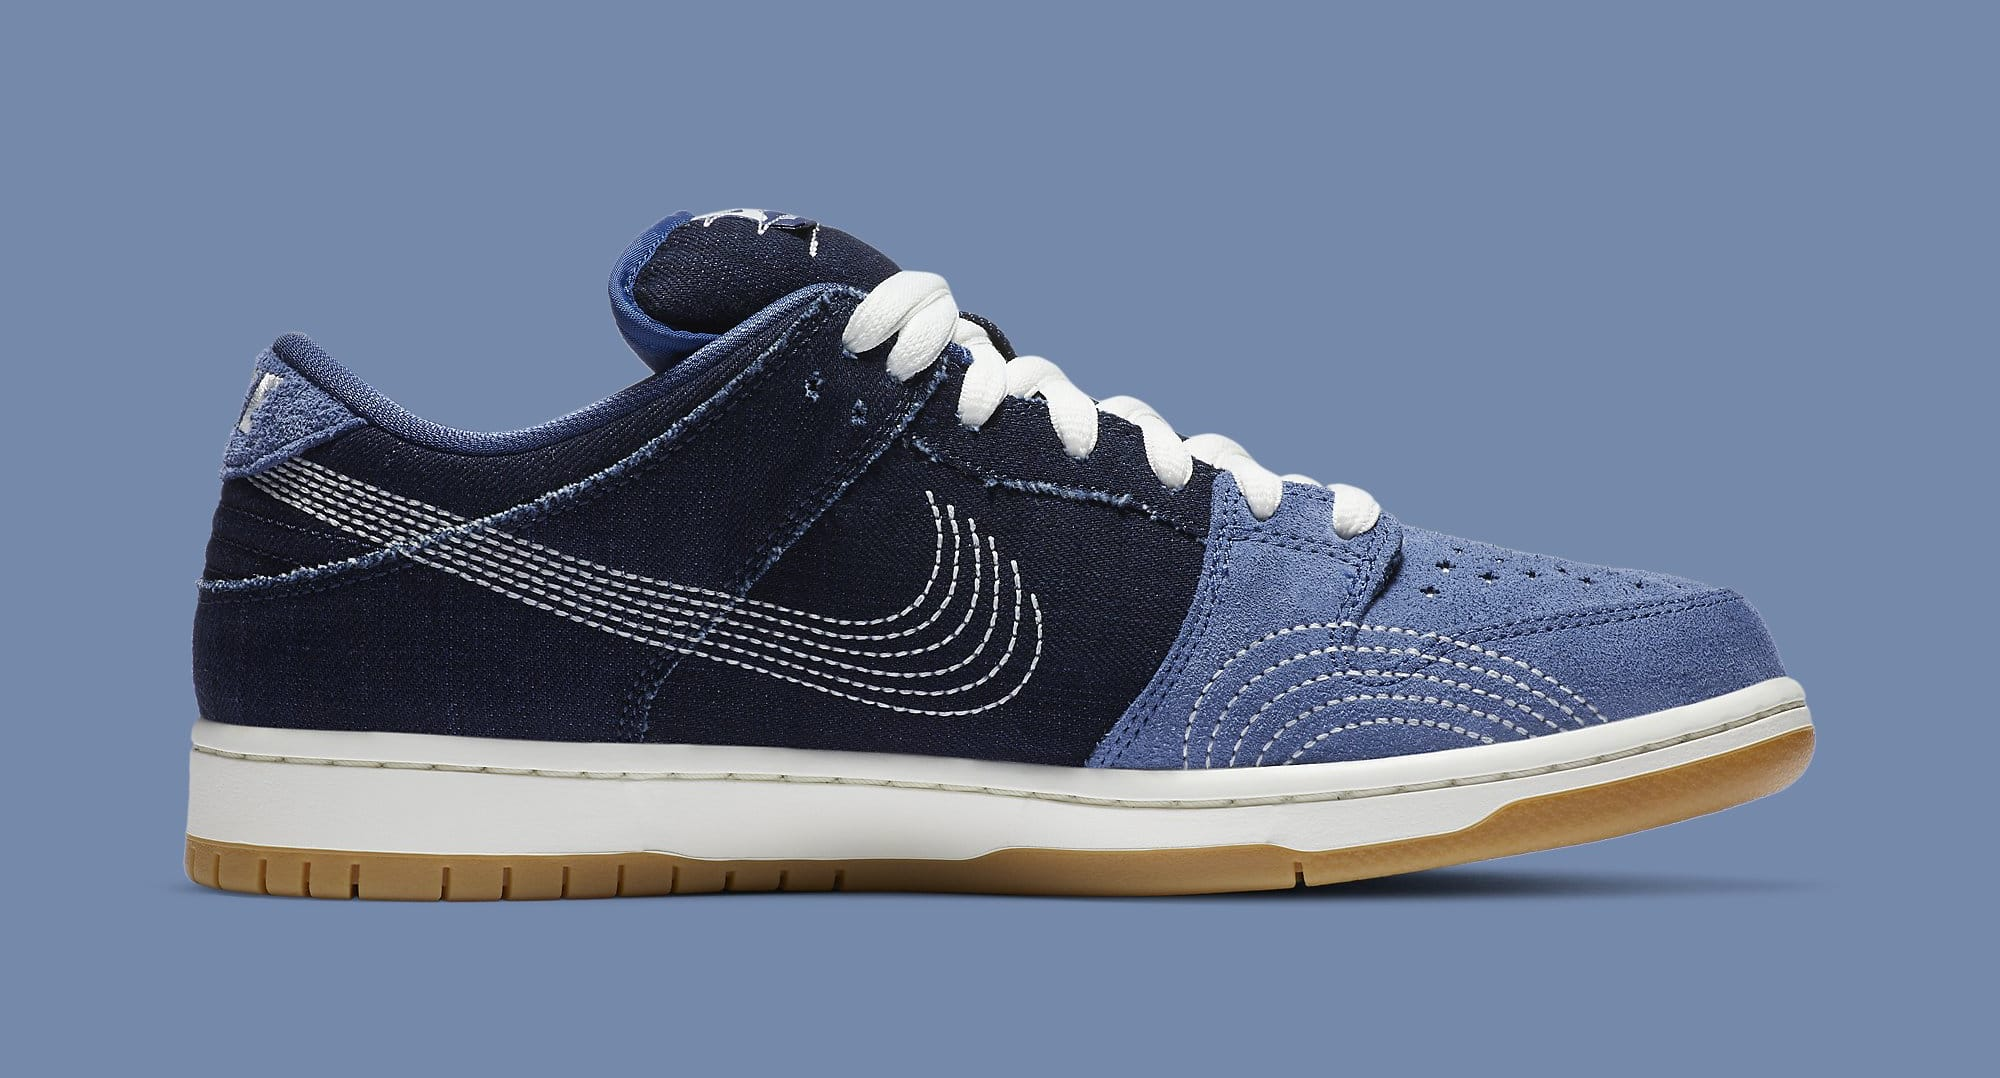 Nike SB Dunk Low 'Sashiko' CV0316-400 Medial